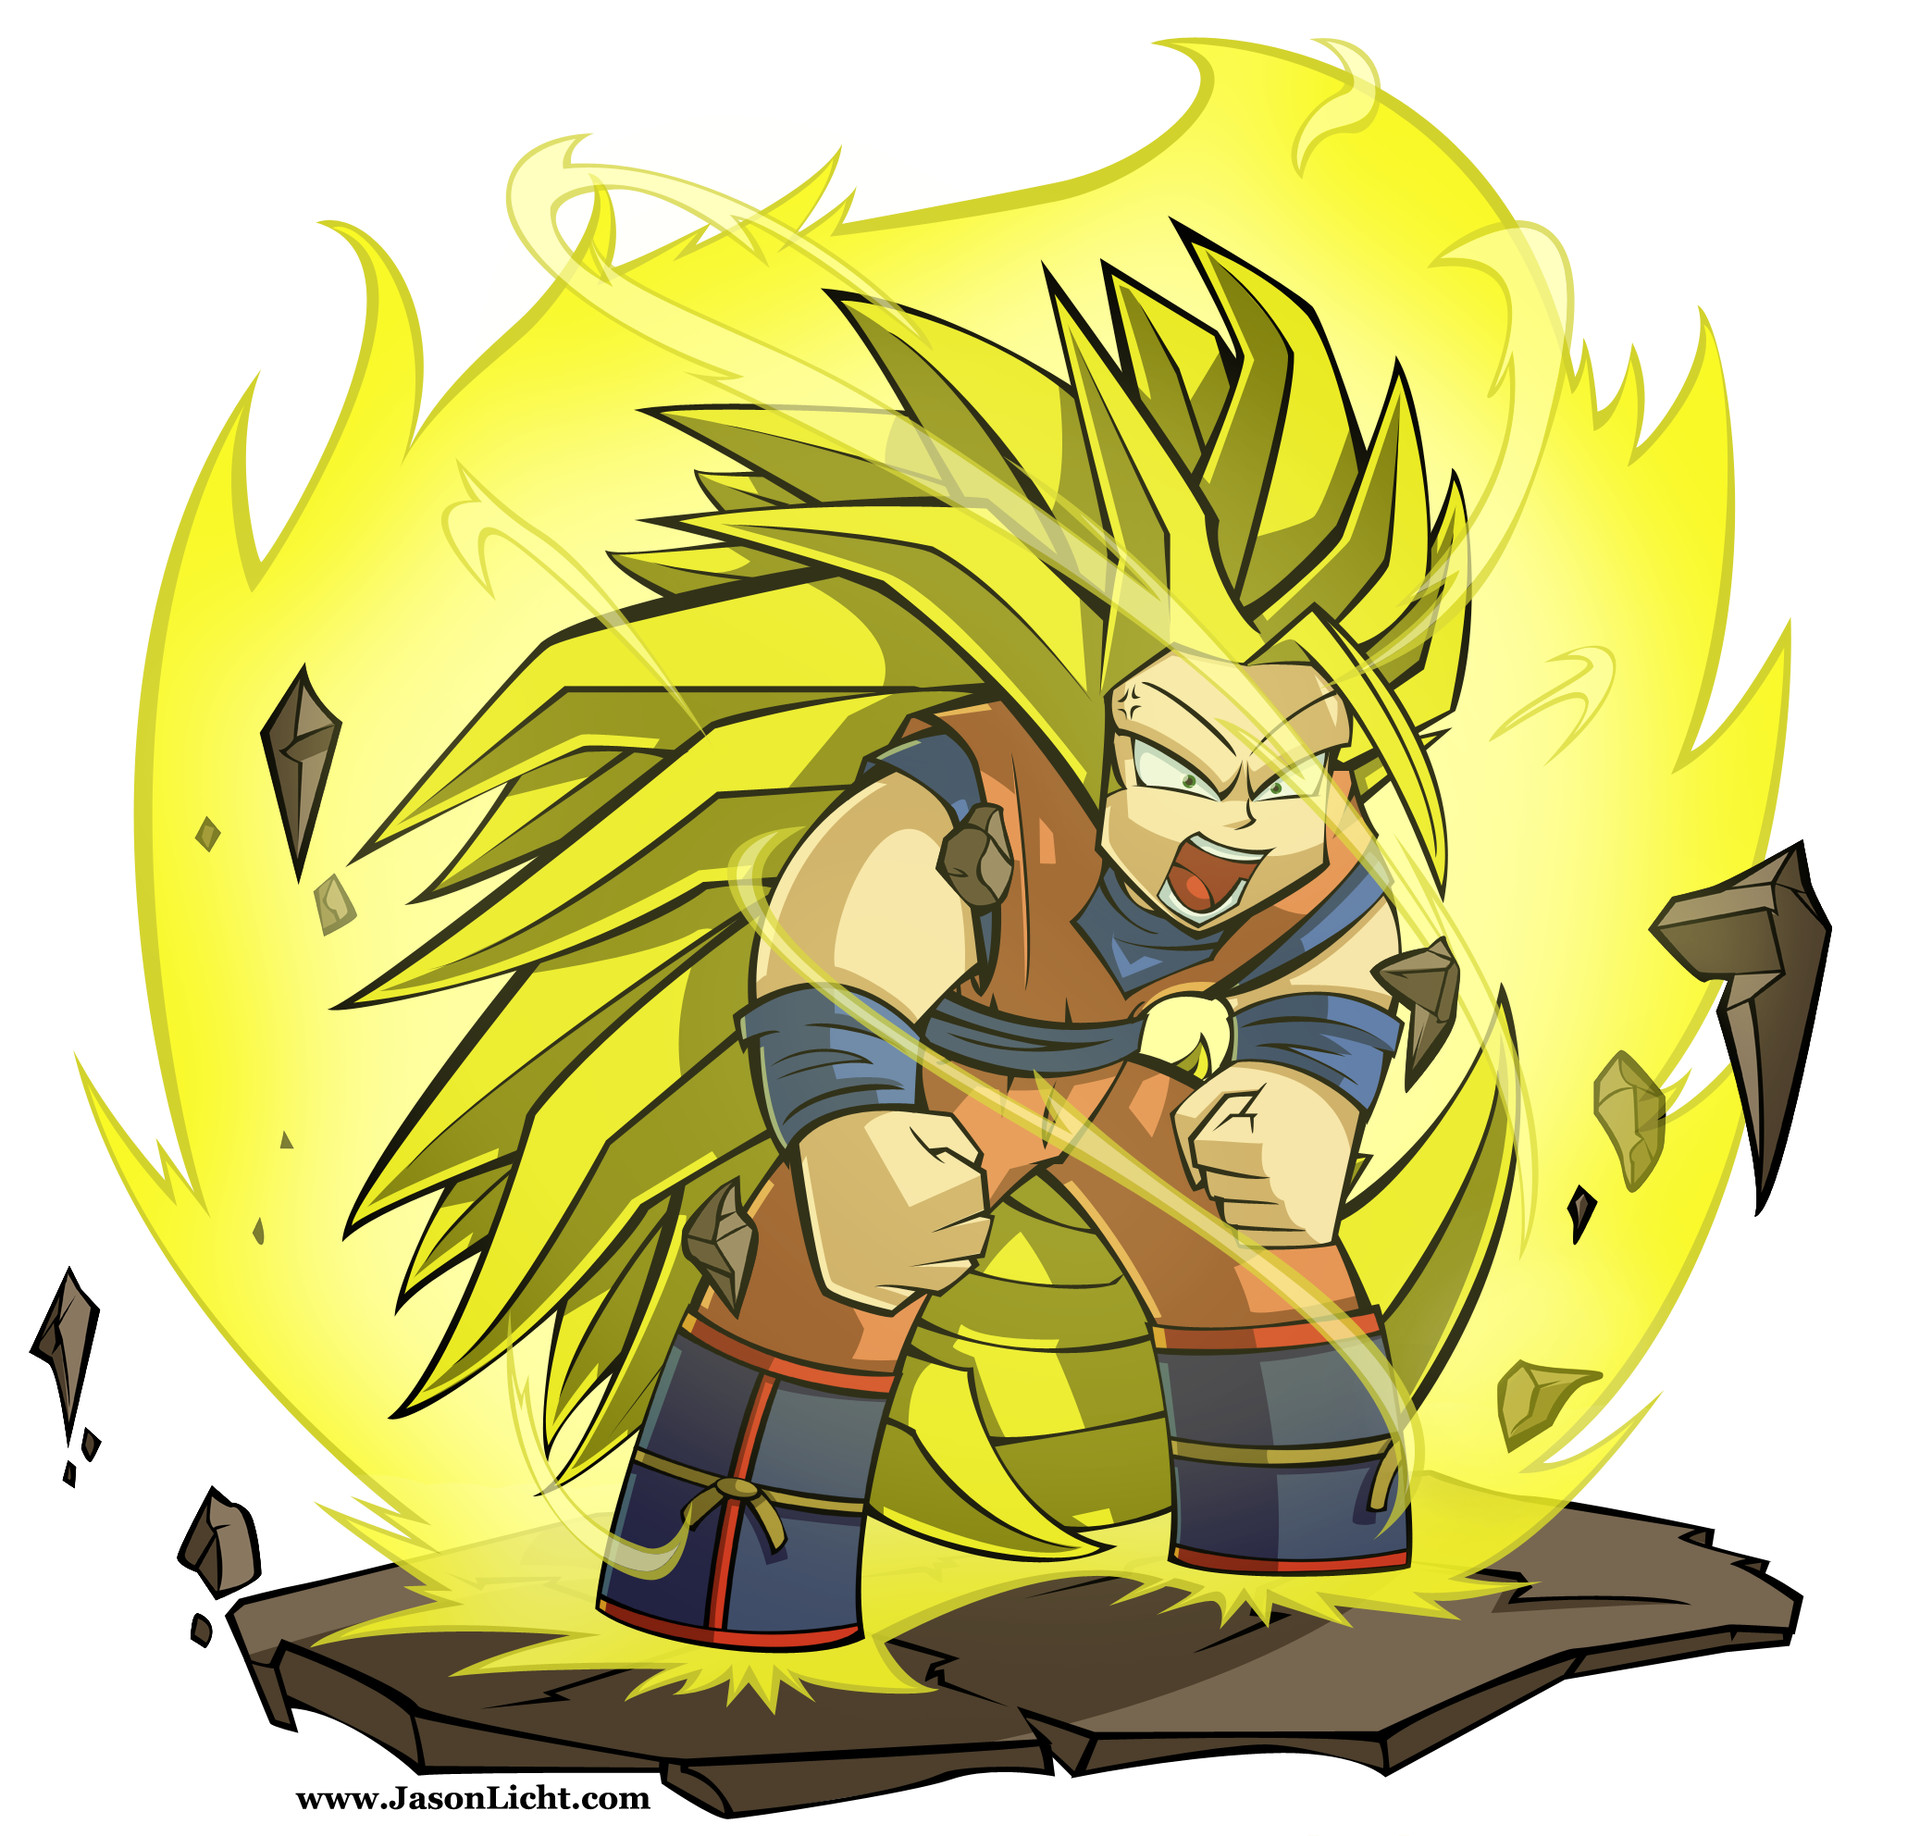 Jason licht gokucolor